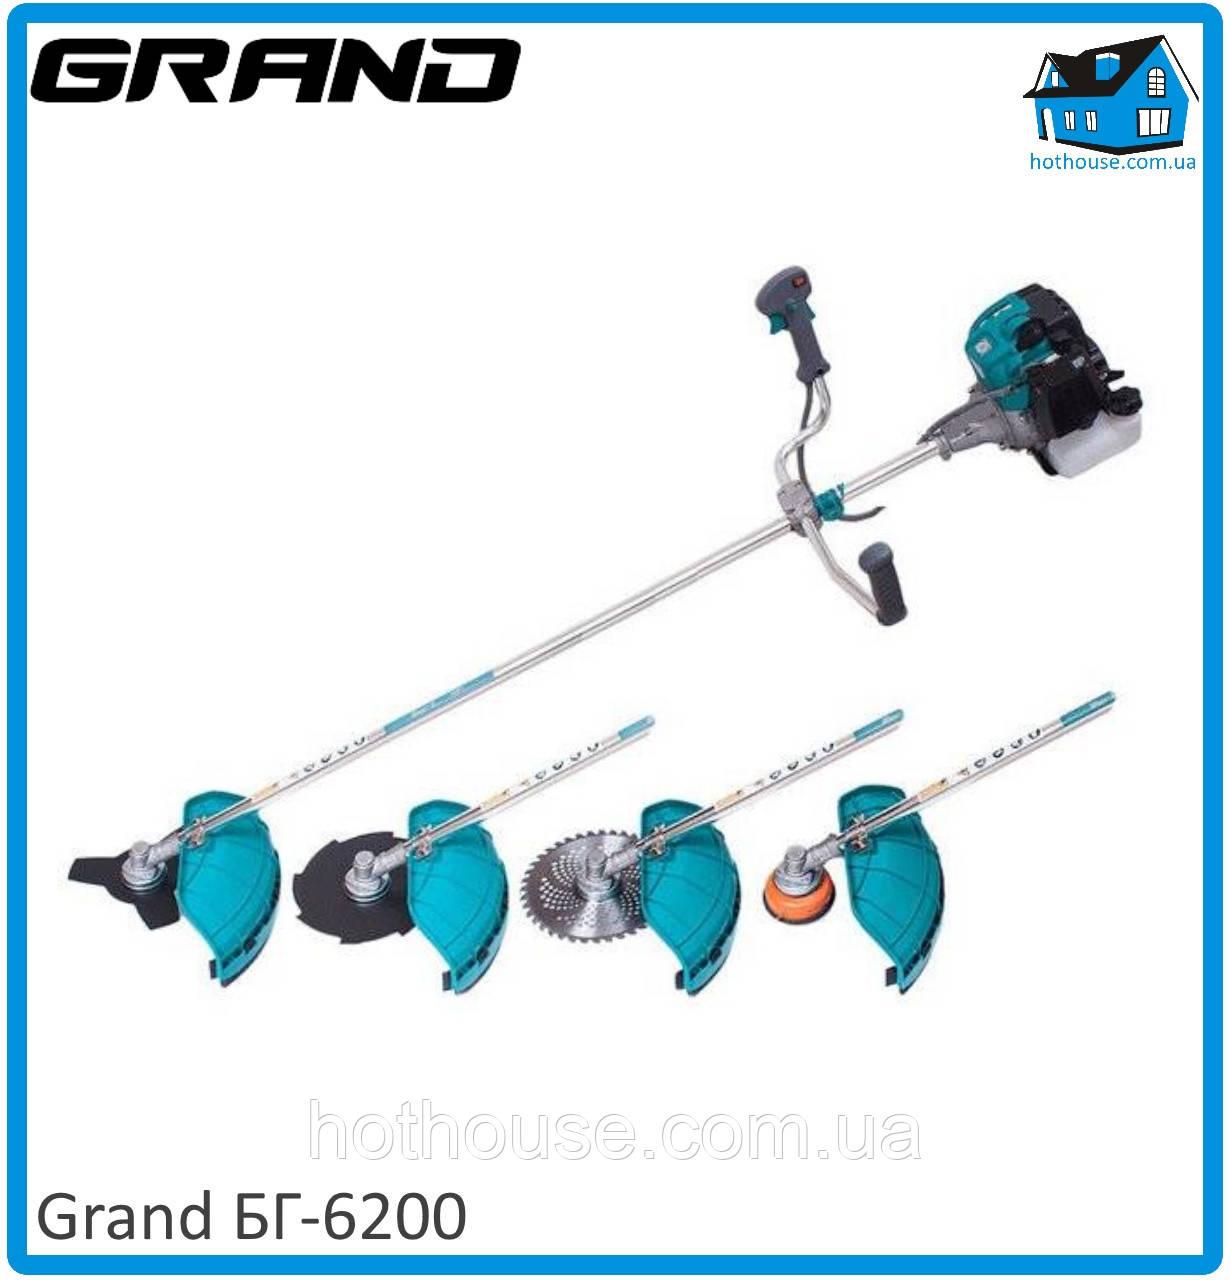 Бензокоса Grand БГ-6200